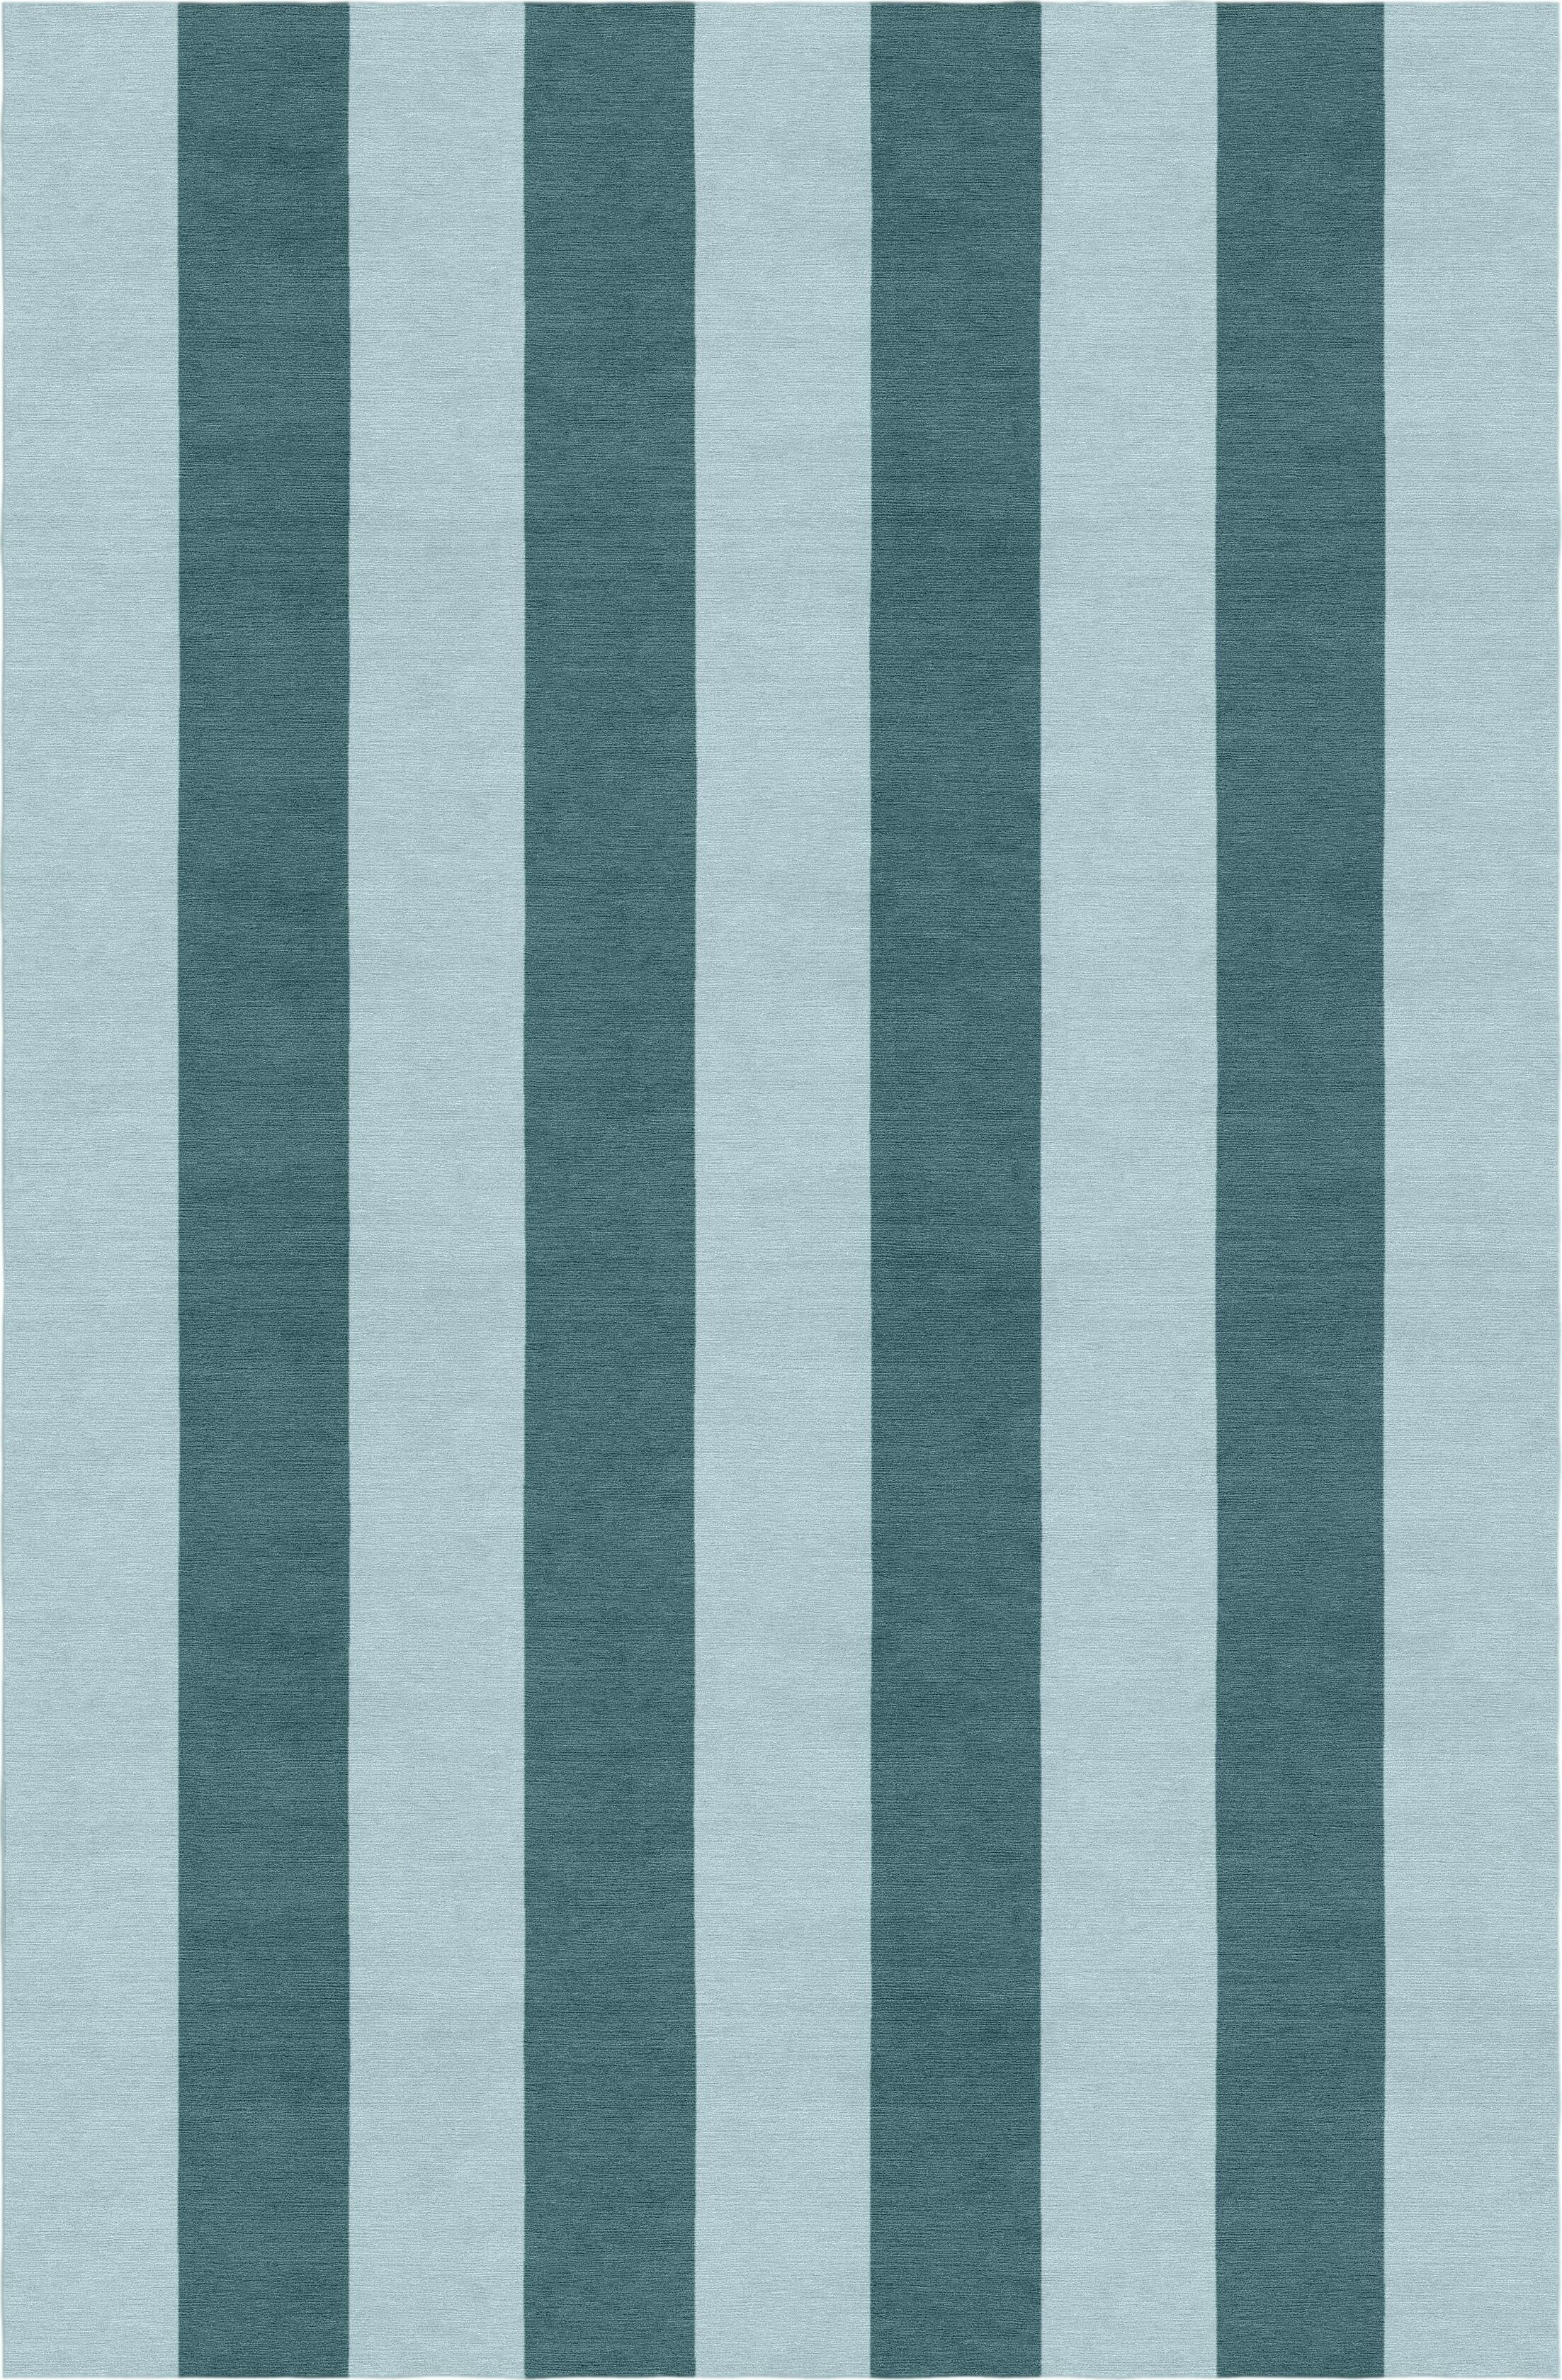 Waterman Stripe Hand-Woven Wool Light Blue/Gray Area Rug Rug Size: Rectangle 6' x 9'